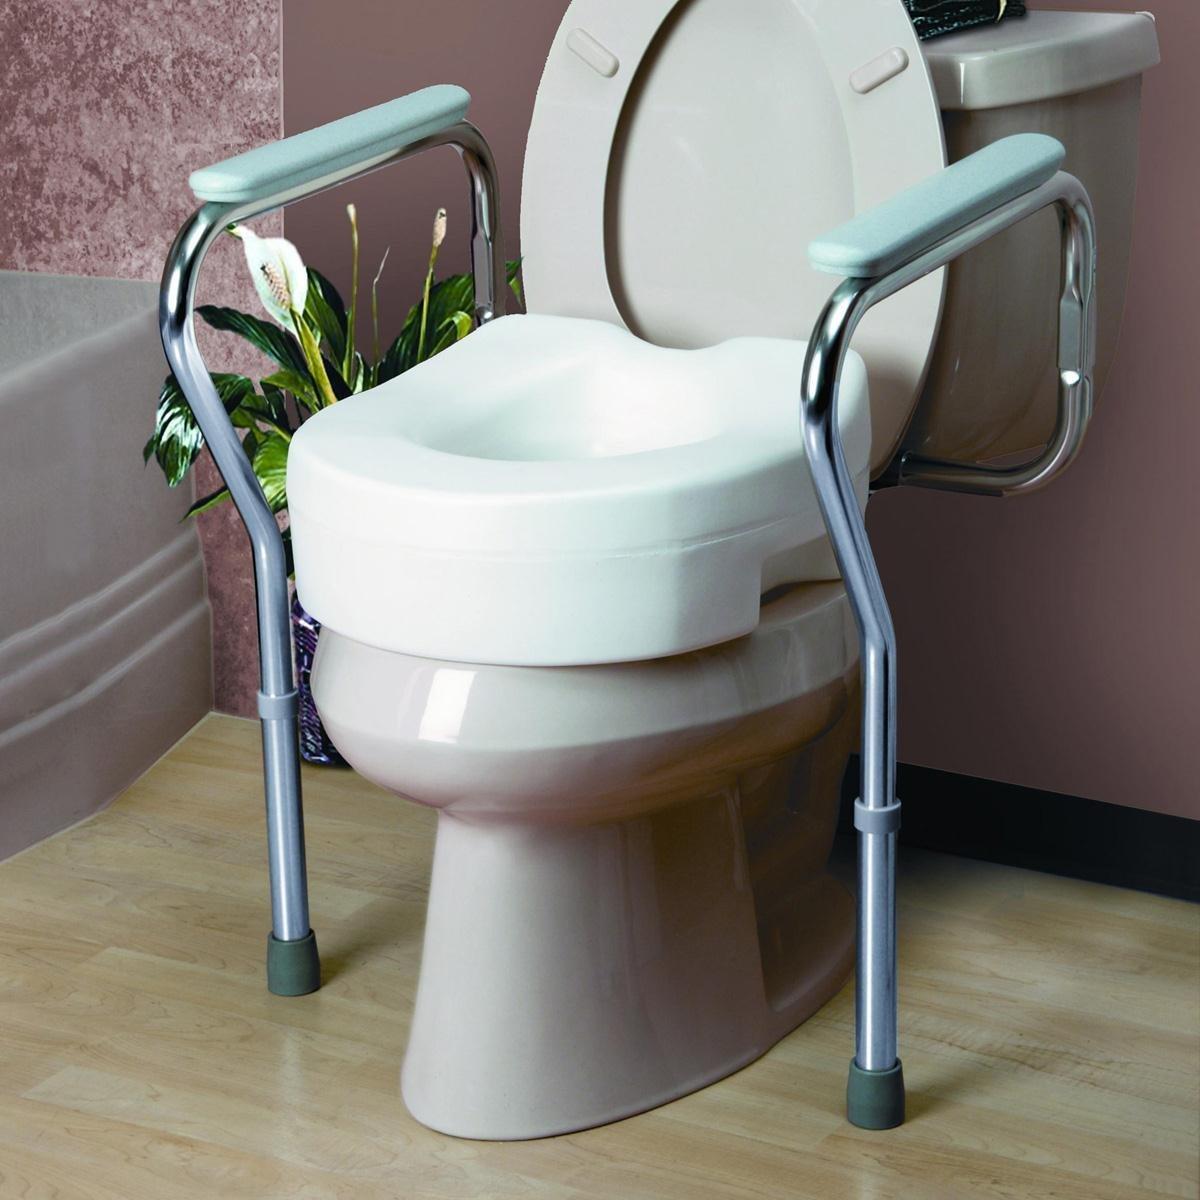 Amazon Com Invacare Raised Toilet Seat Invacare Health